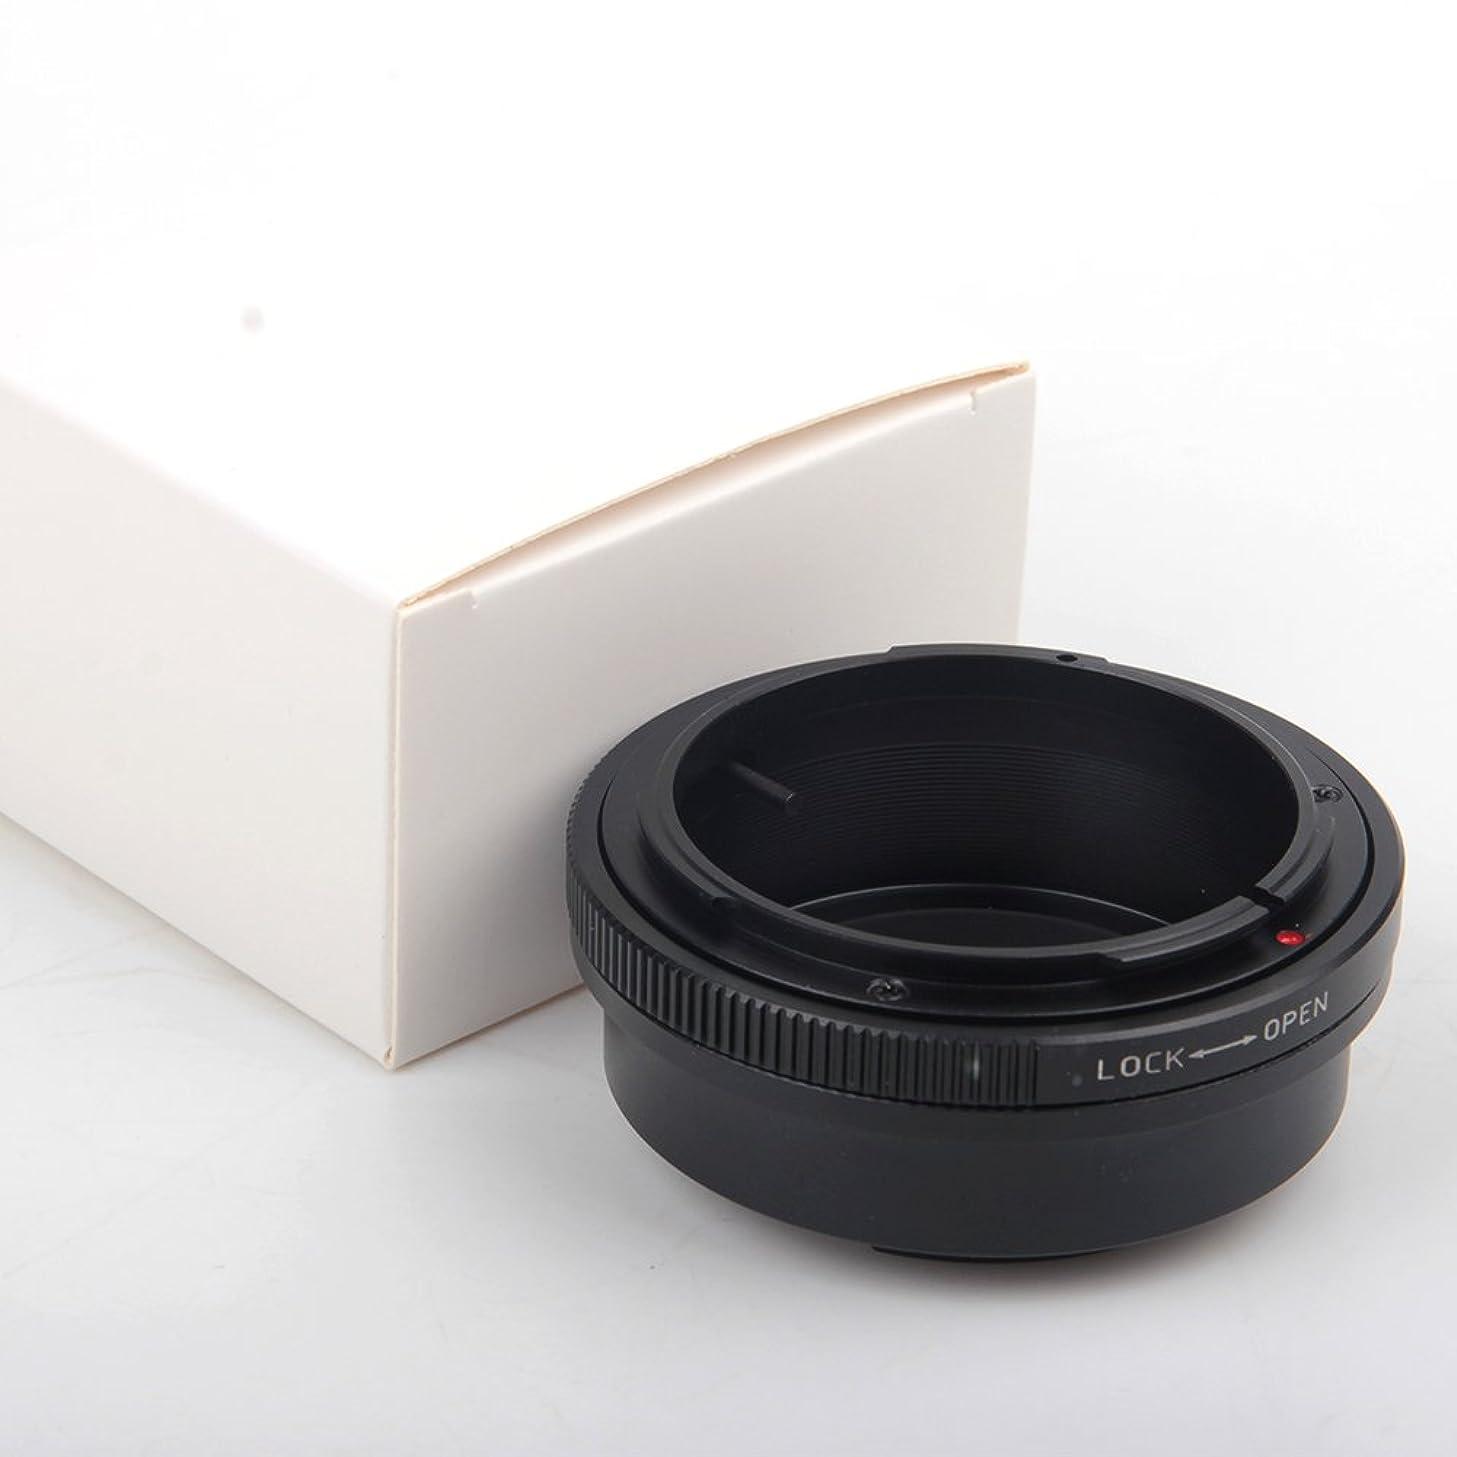 Lens Adapter Suit for Canon FD Lens to Sony E Mount A5100 A6000 A5000 A3000 NEX-5T NEX-3N NEX-6 NEX-5R Camera